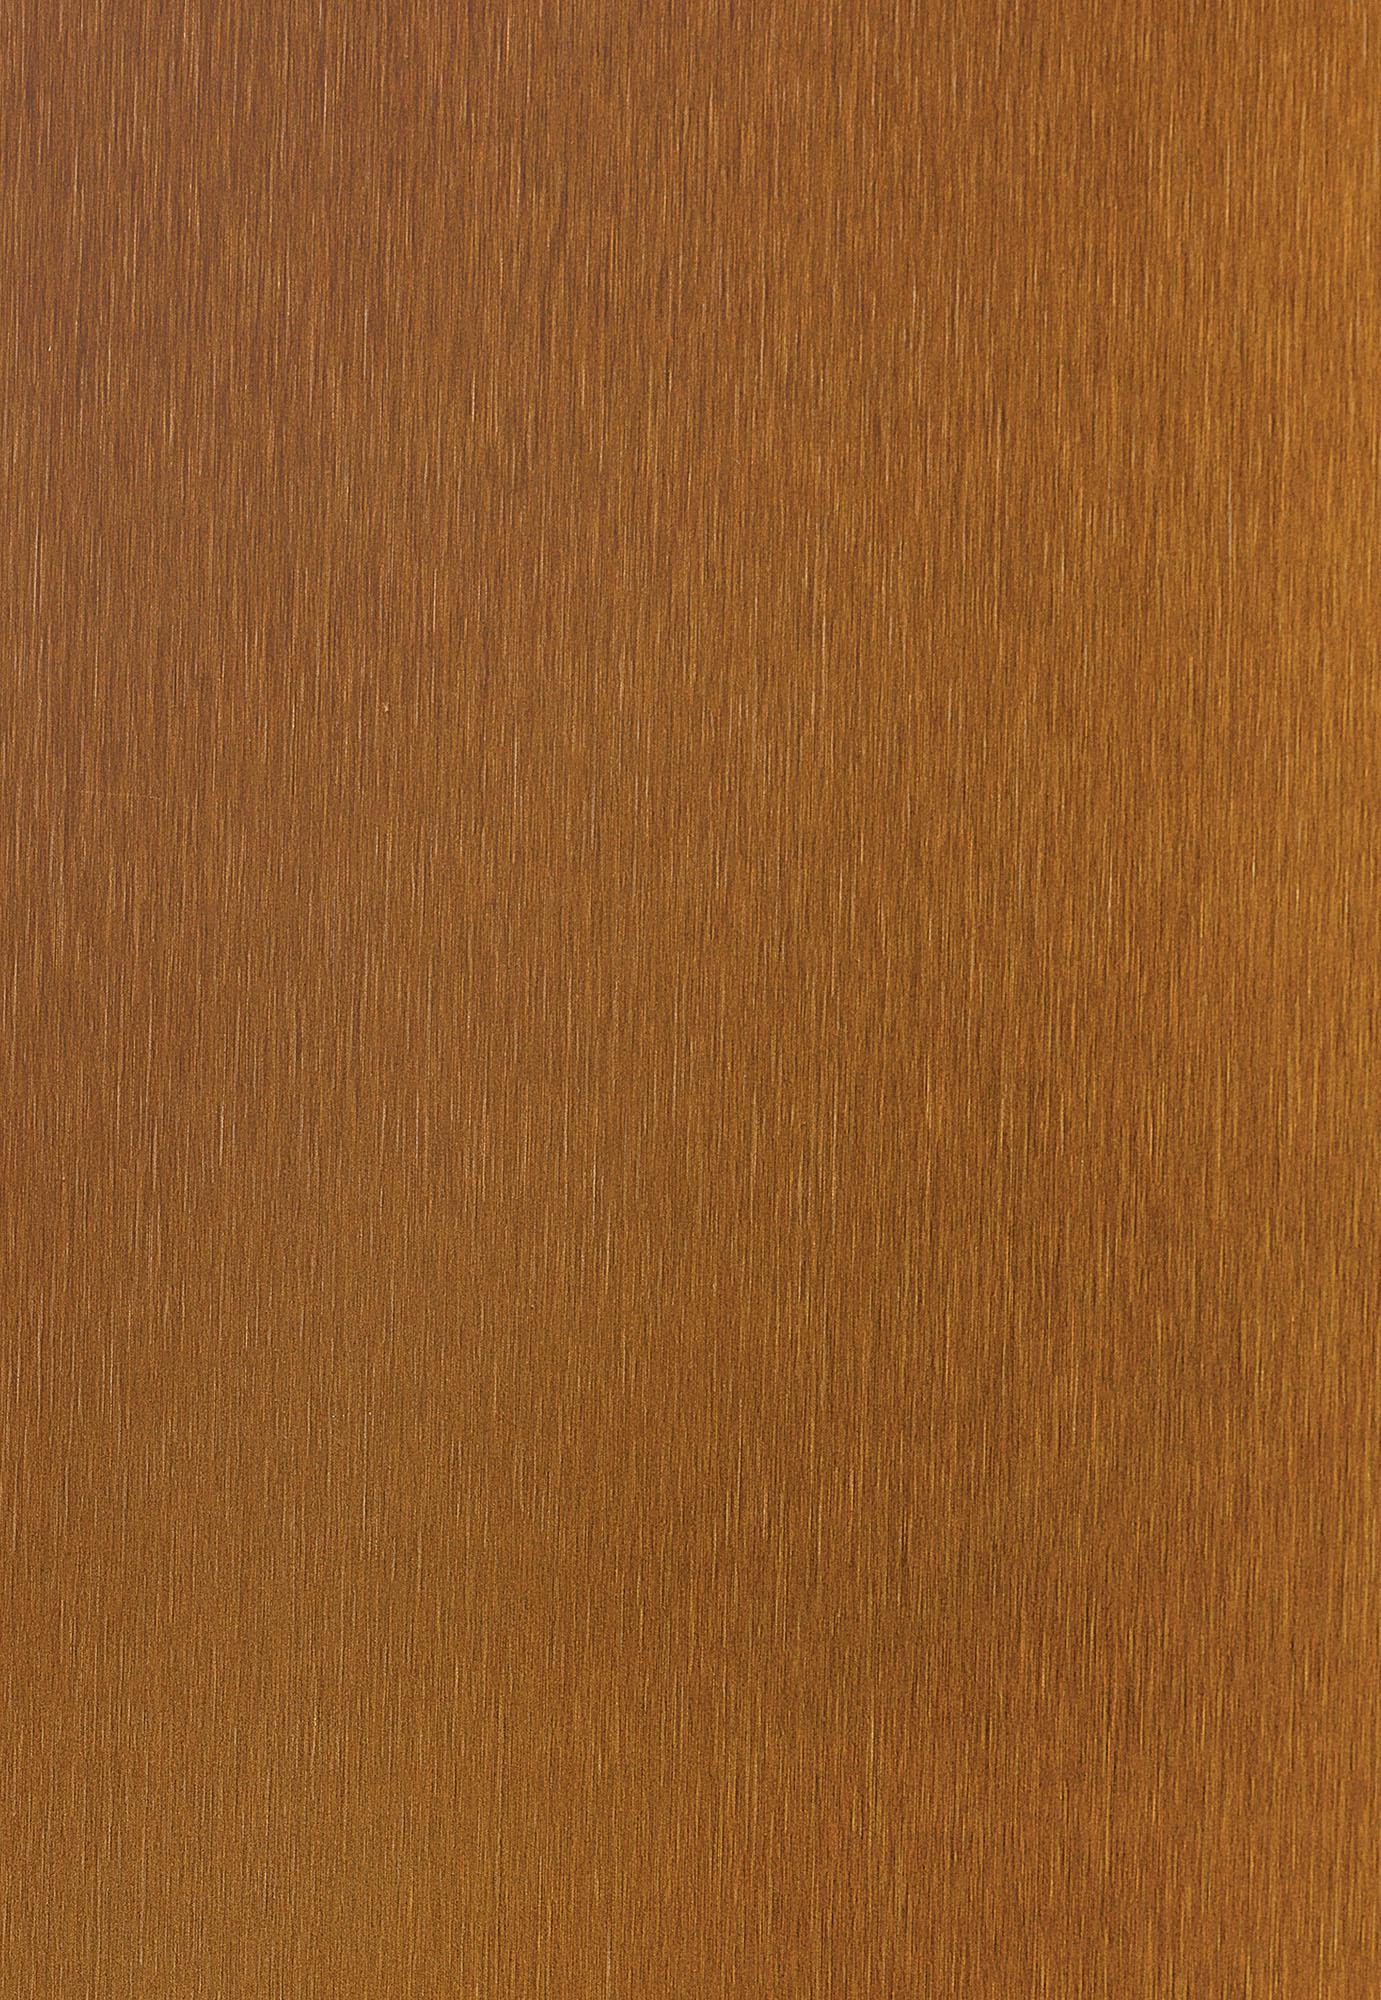 M6422 Brushed Cupro